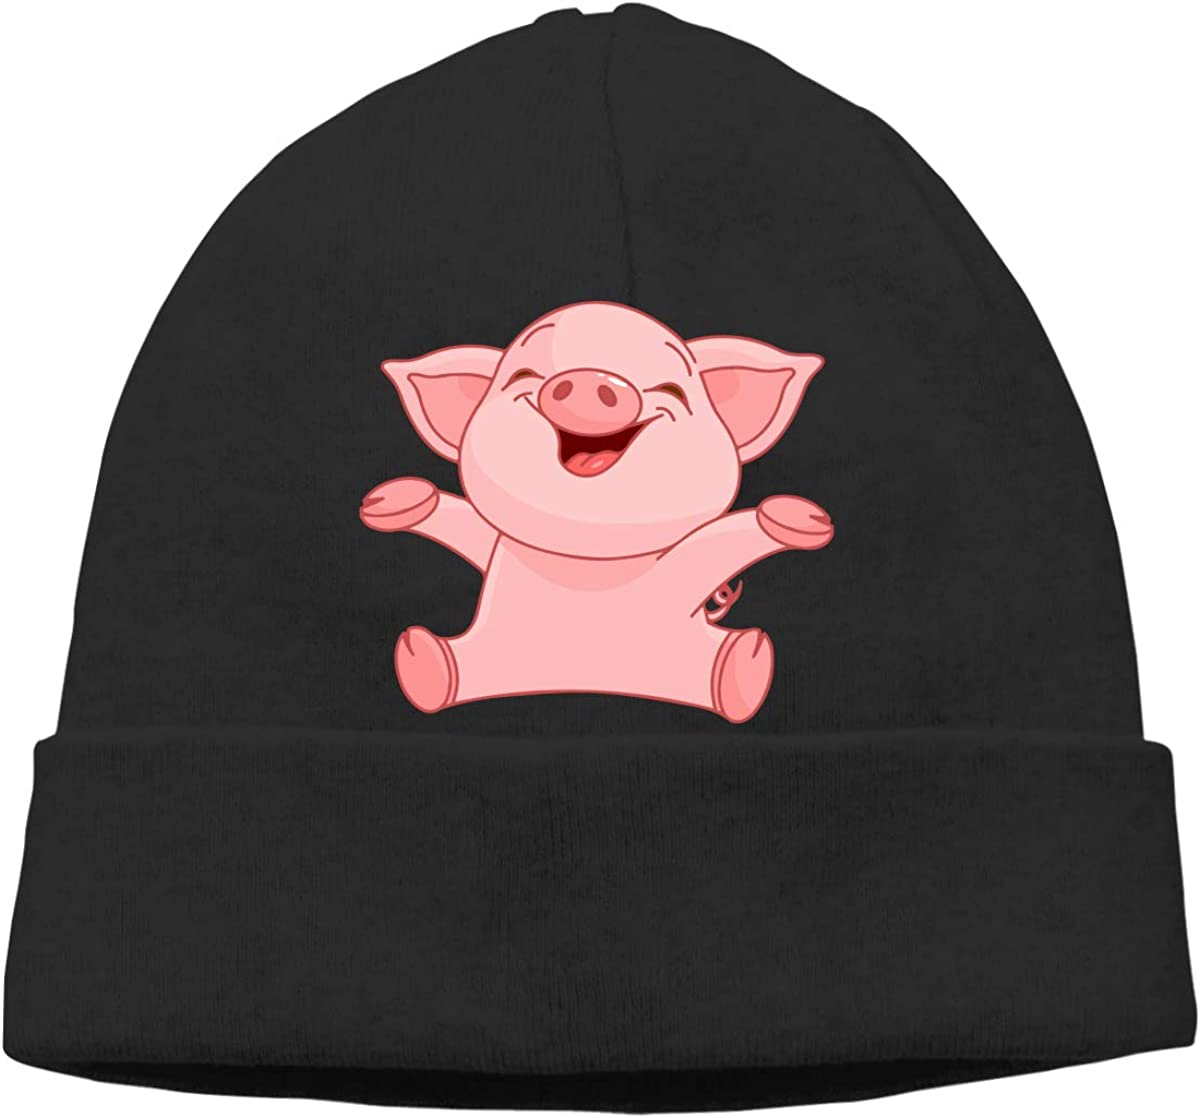 Unisex Cute Pig Soft Skull Beanie Cap Soft Hat